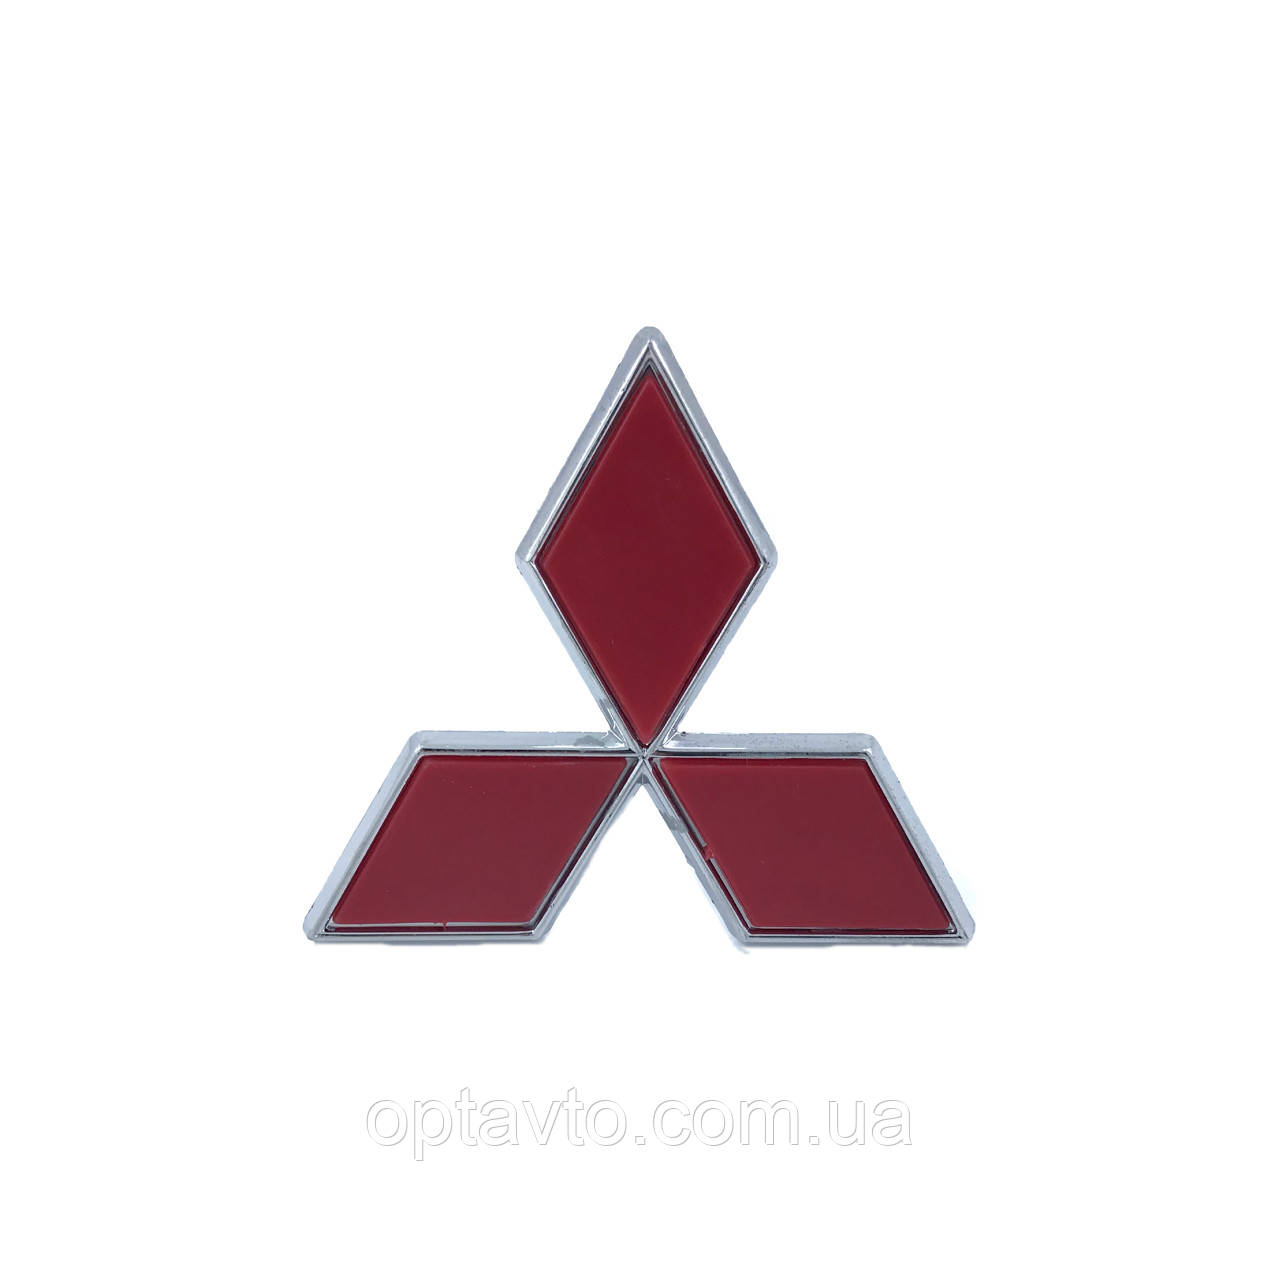 Эмблема автомобильная, логотип Митсубиши (MITSUBISHI)